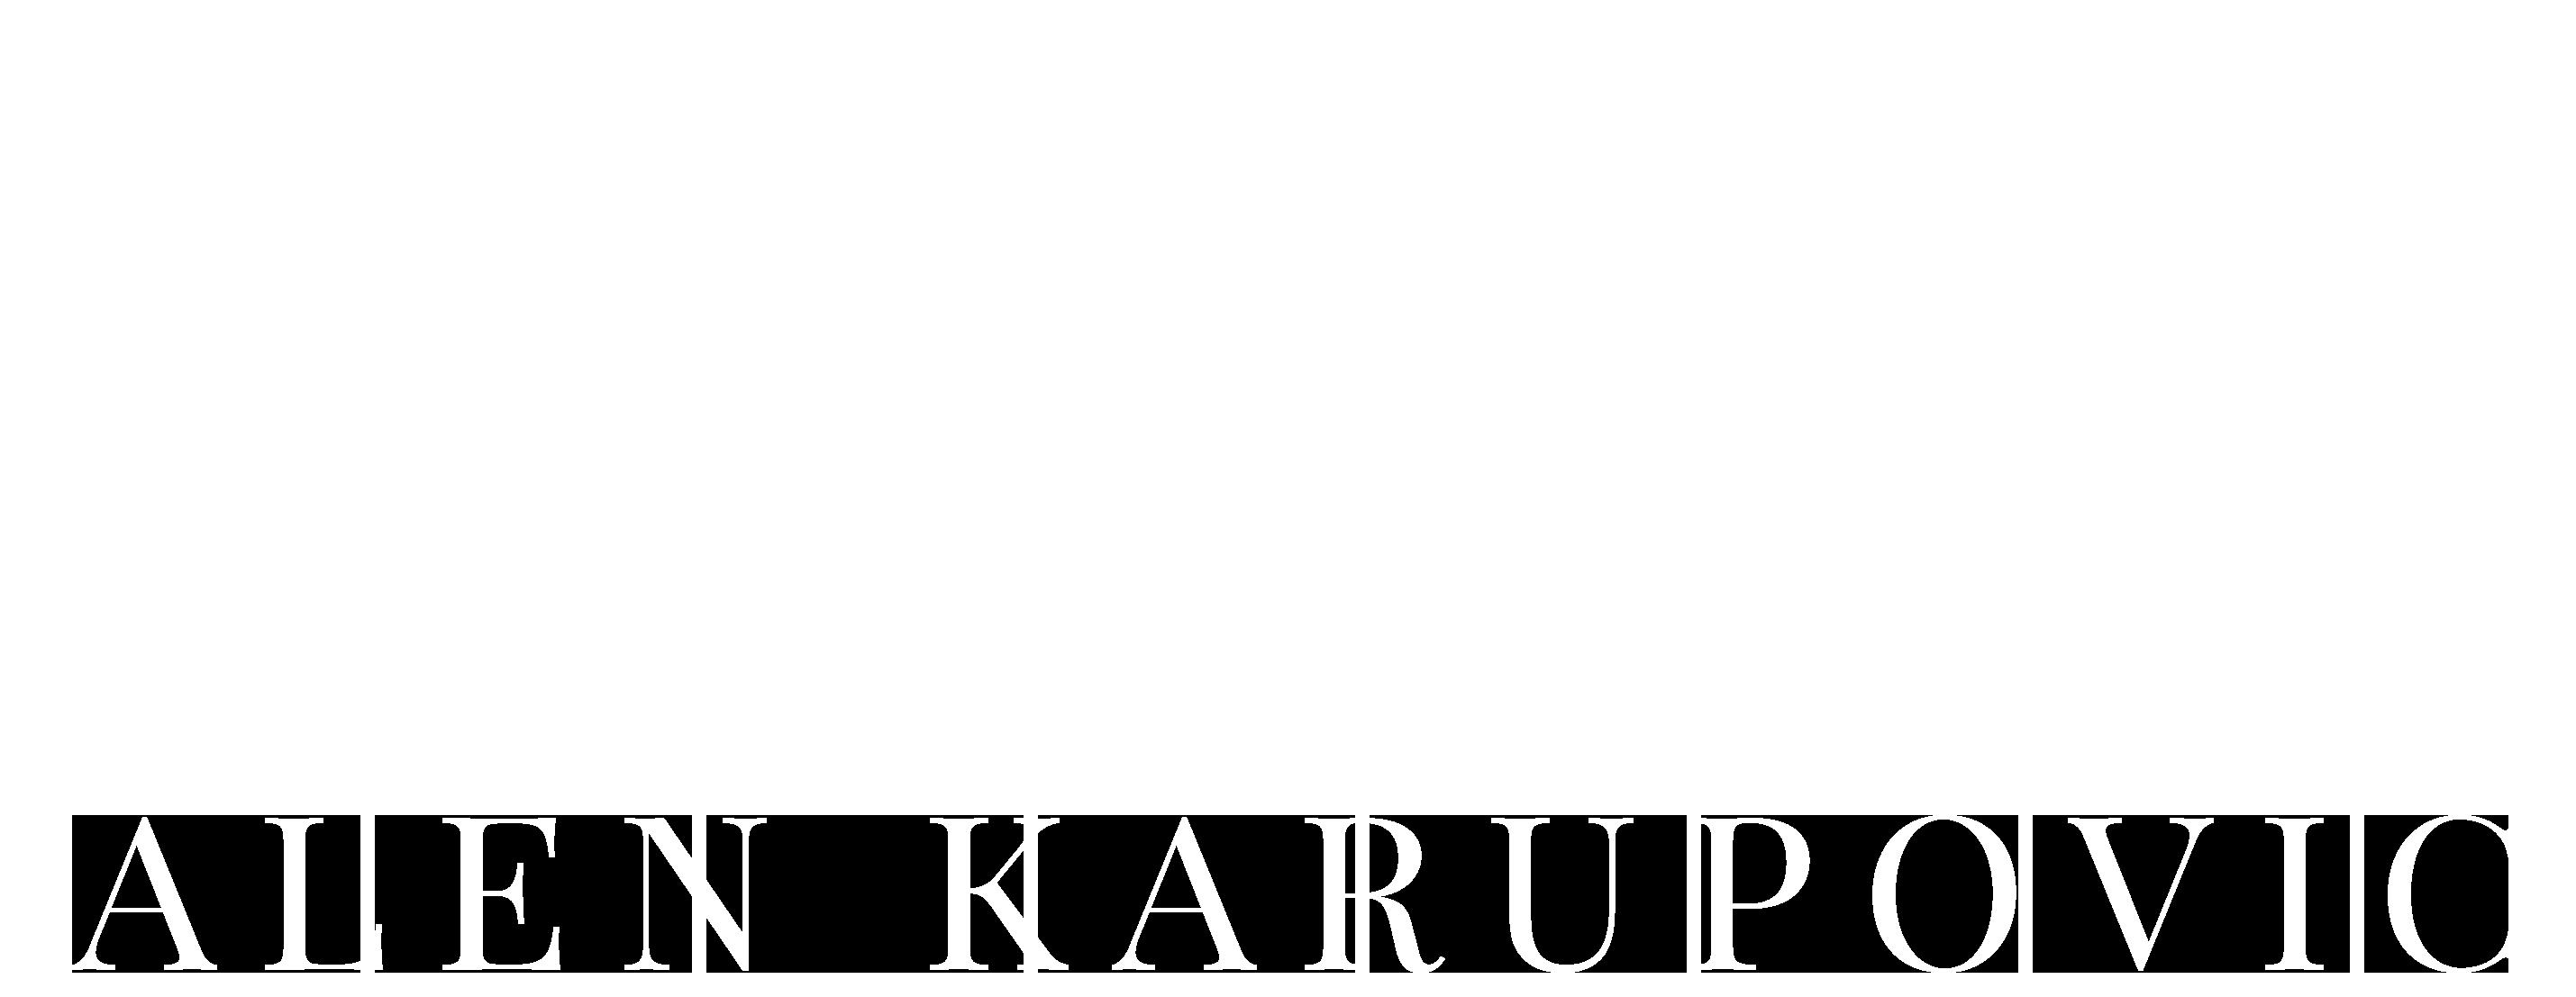 Alen Karupovic